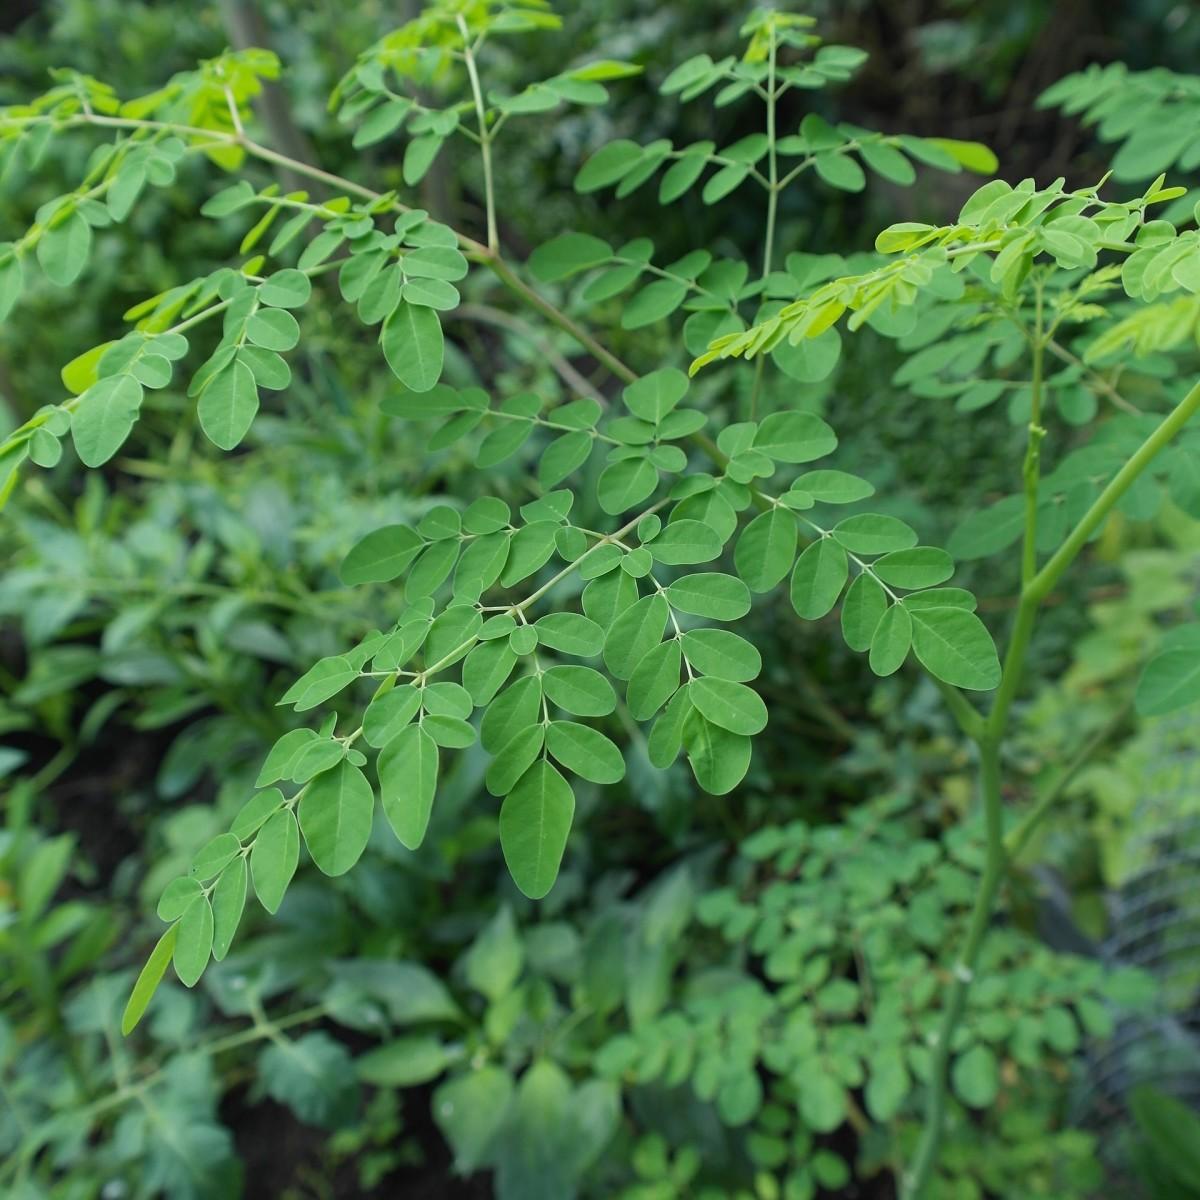 Moringa oleifera, the tree of life